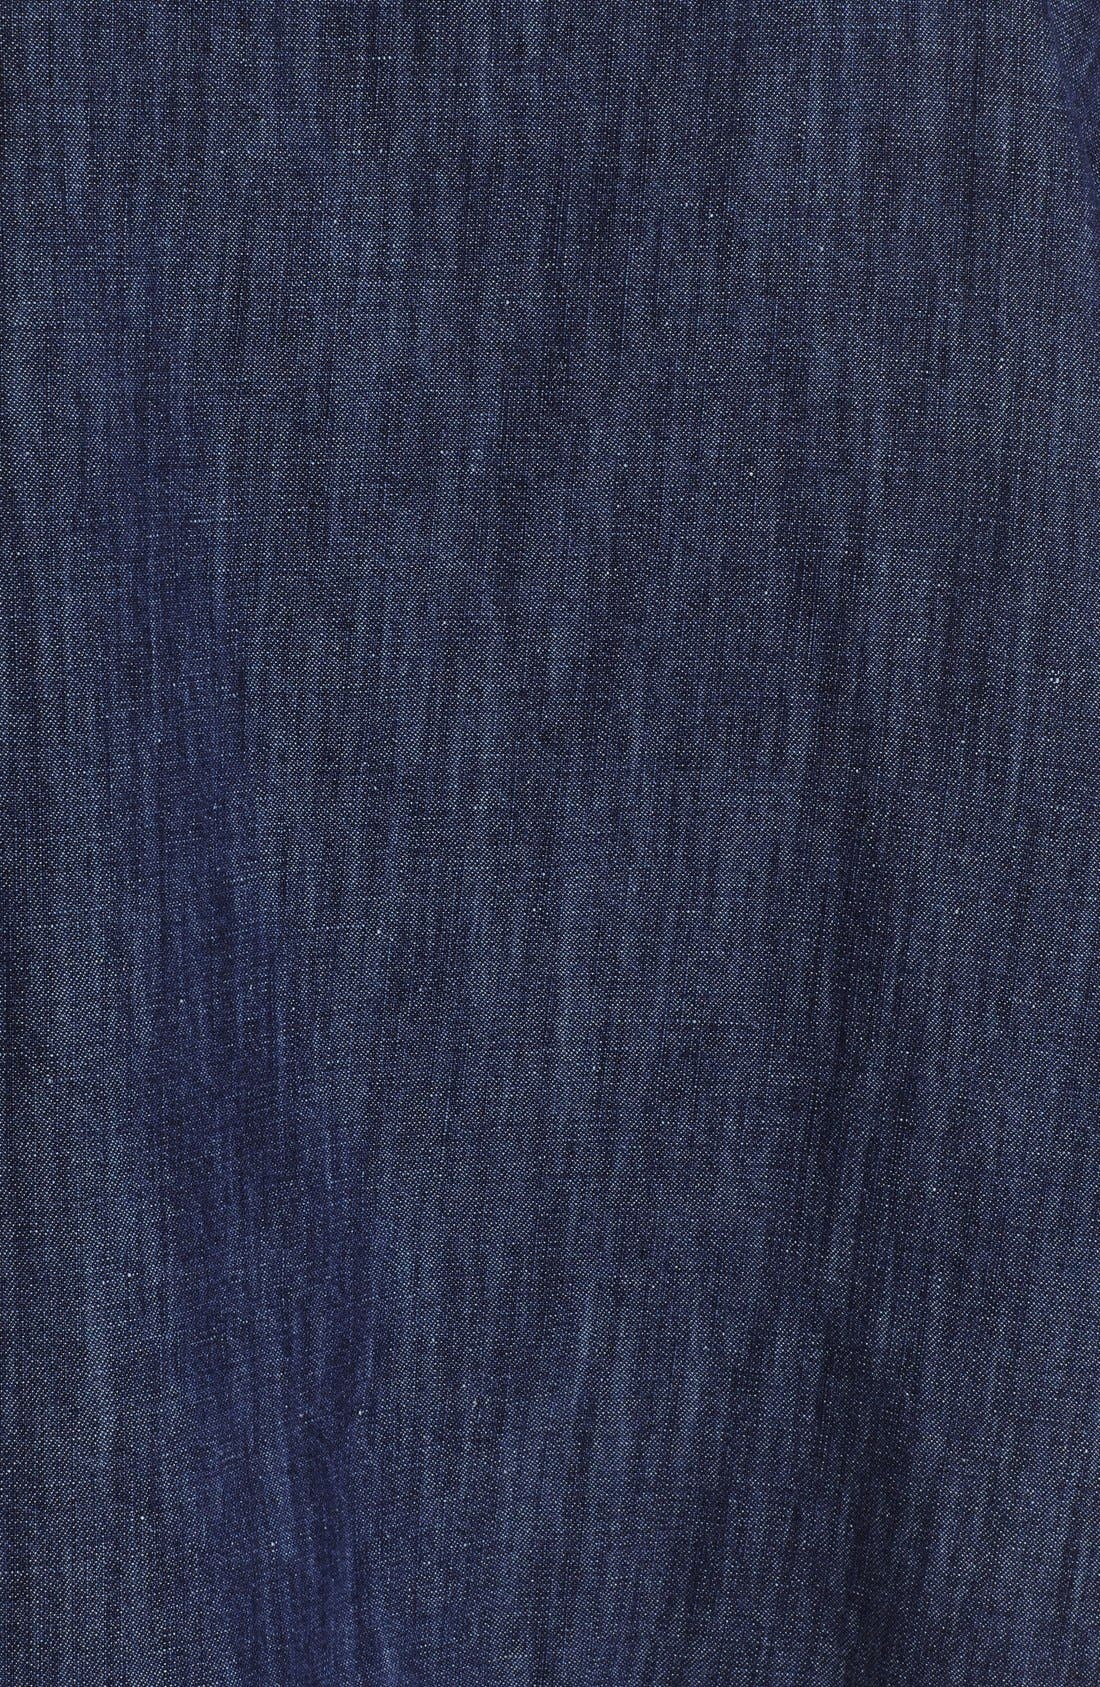 Alternate Image 3  - eskandarCotton & Linen Blouse